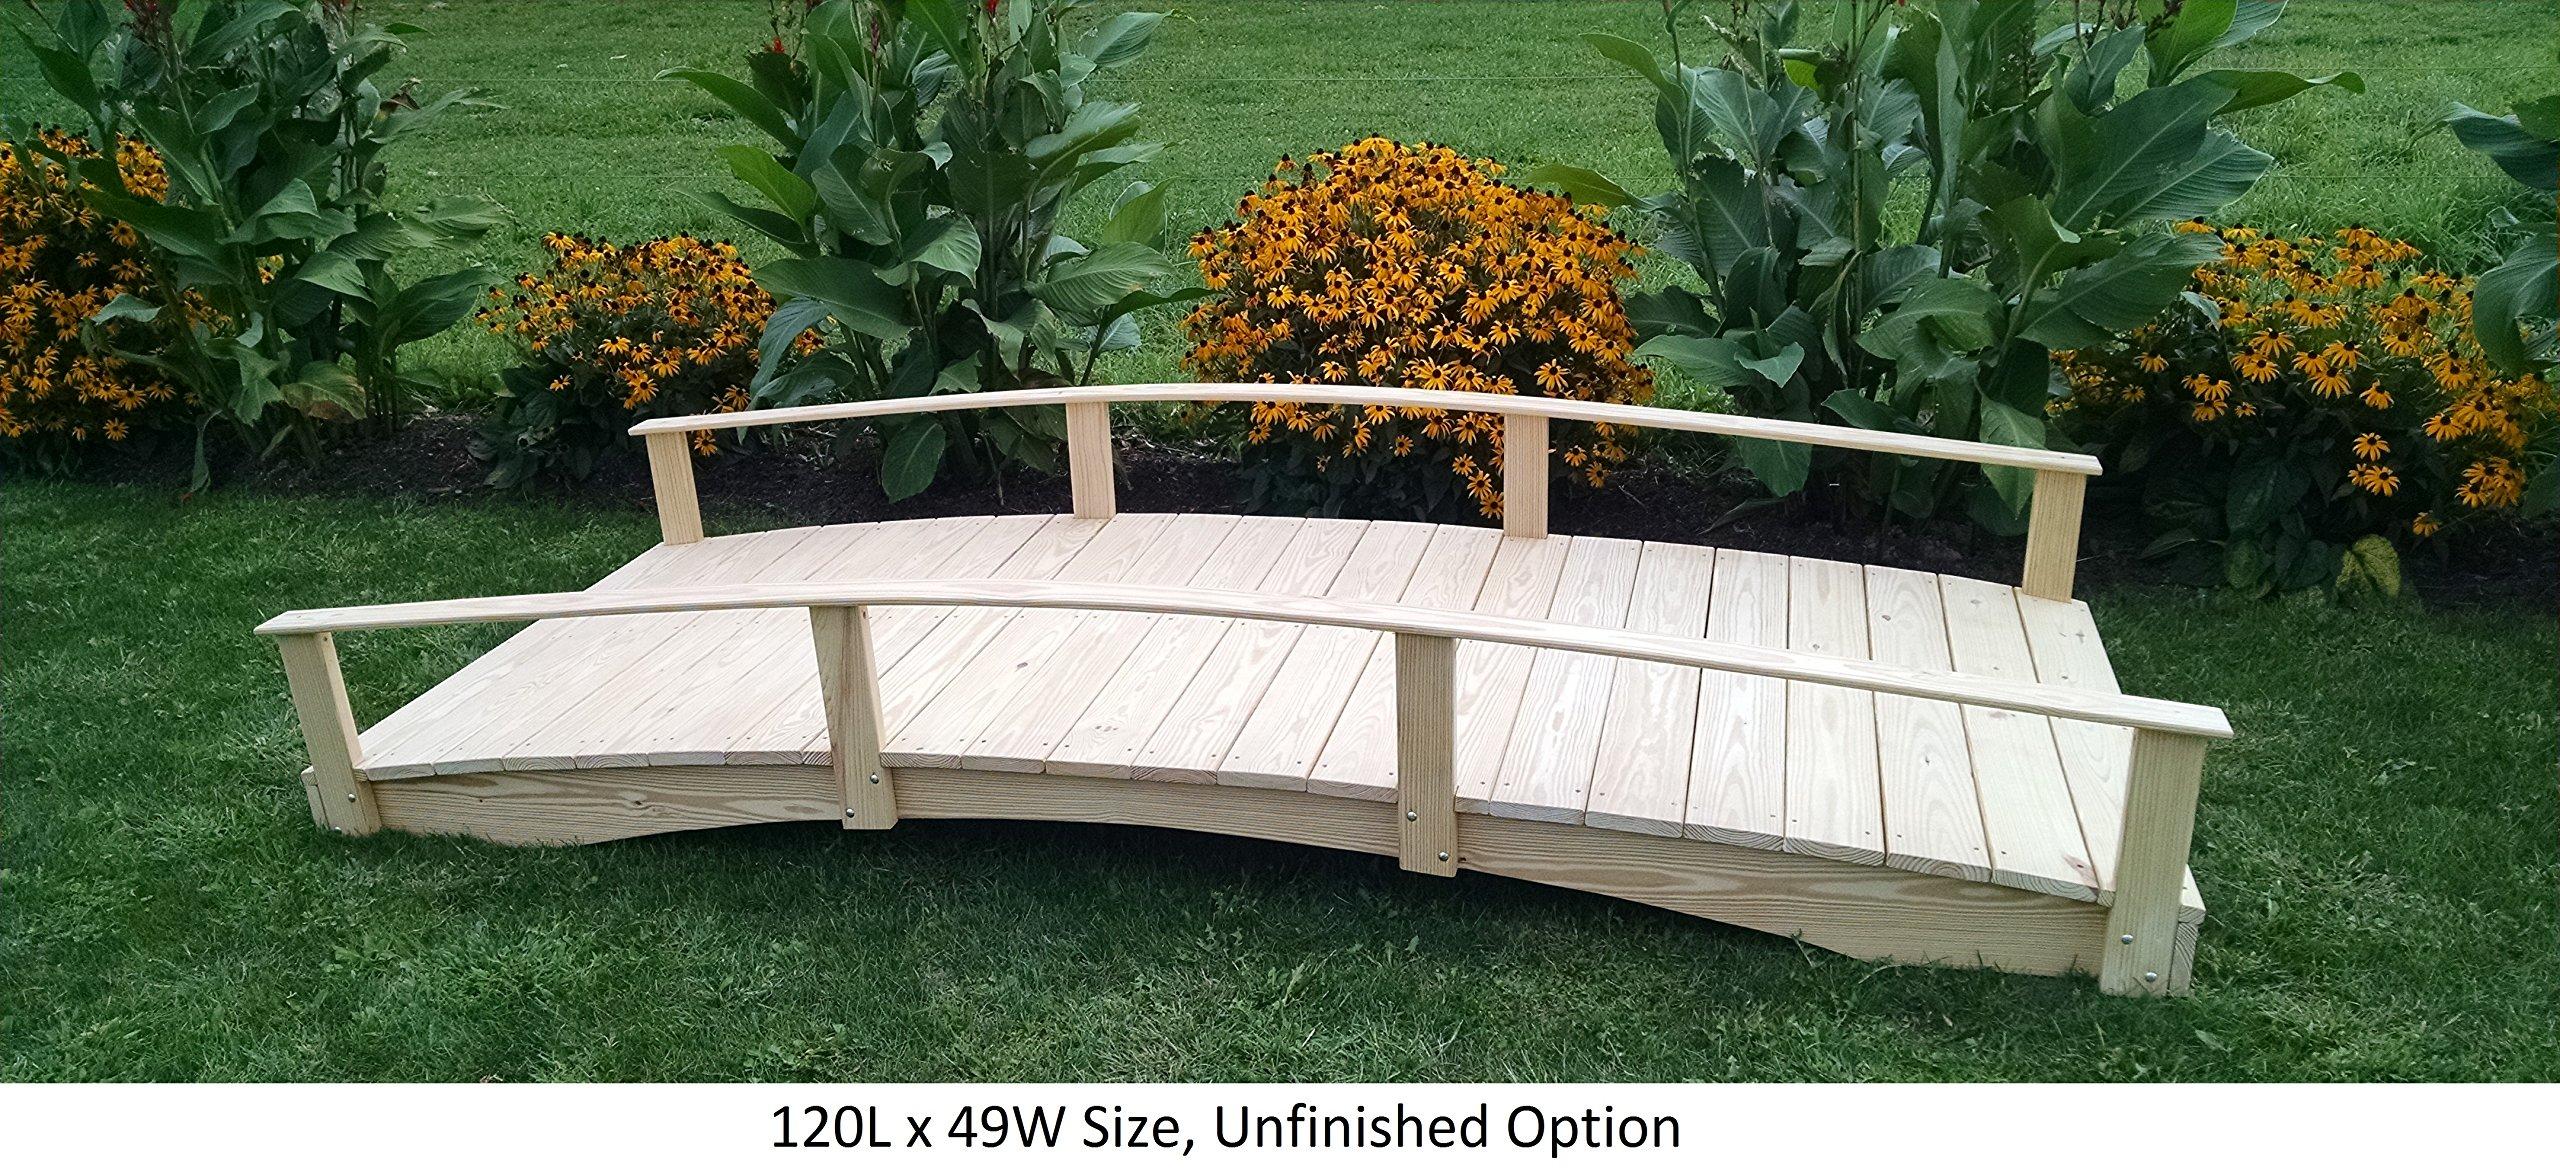 Amish-Made Weight-Bearing Pine 3' x 10' Oriental Bridge, Unfinished